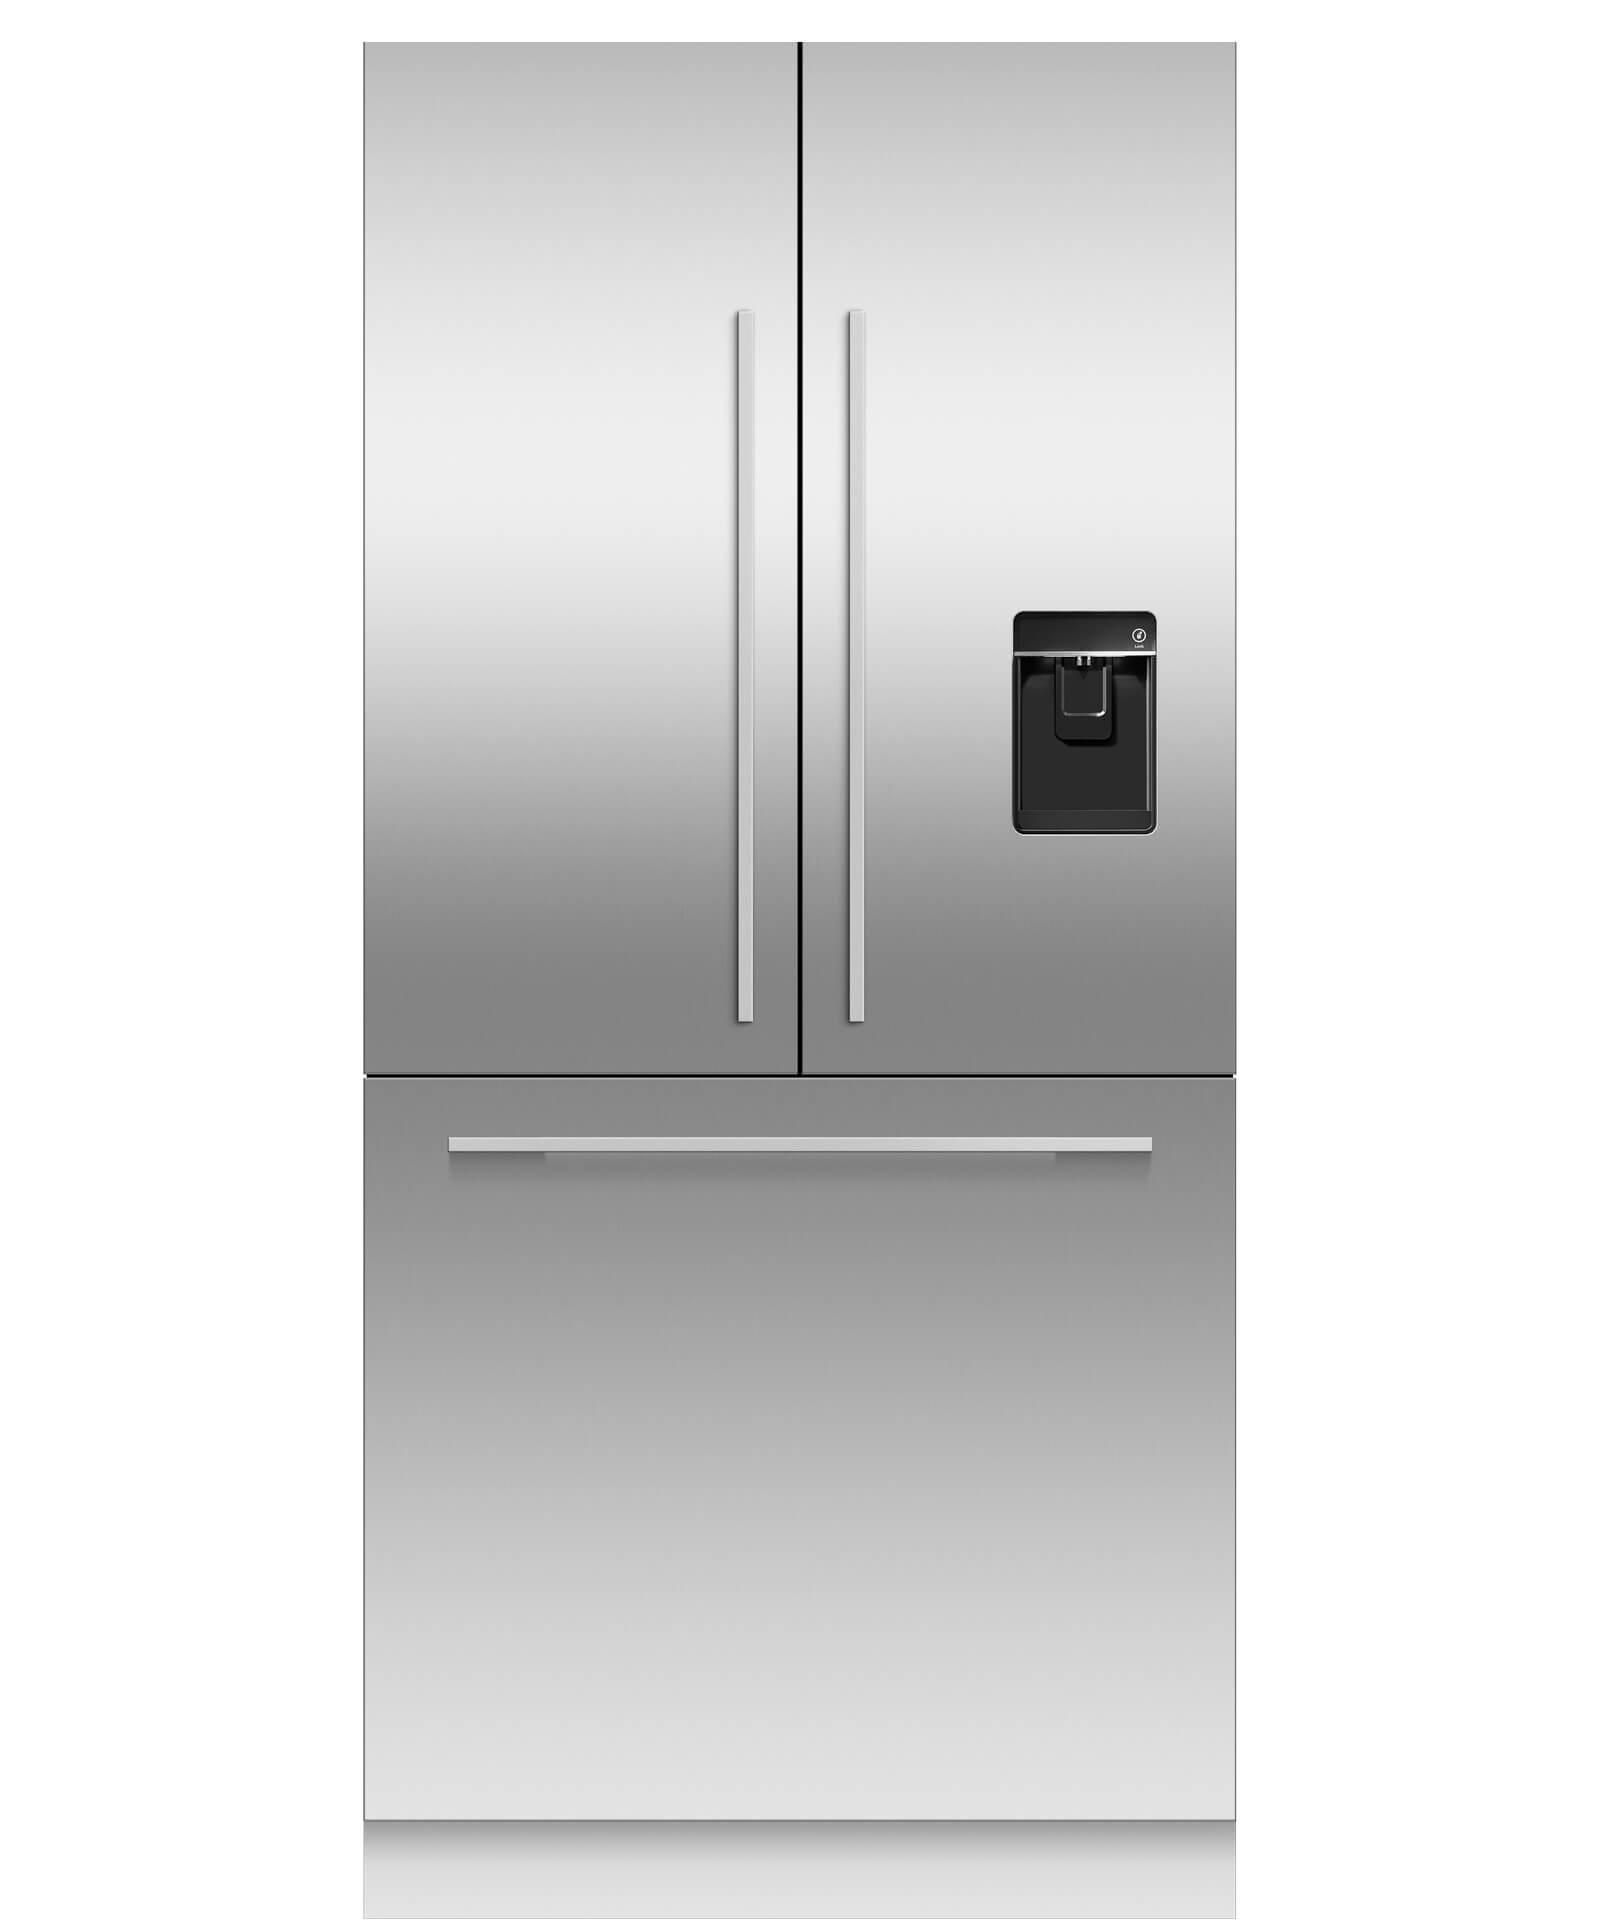 80 Inch Tall Refrigerator Zef Jam